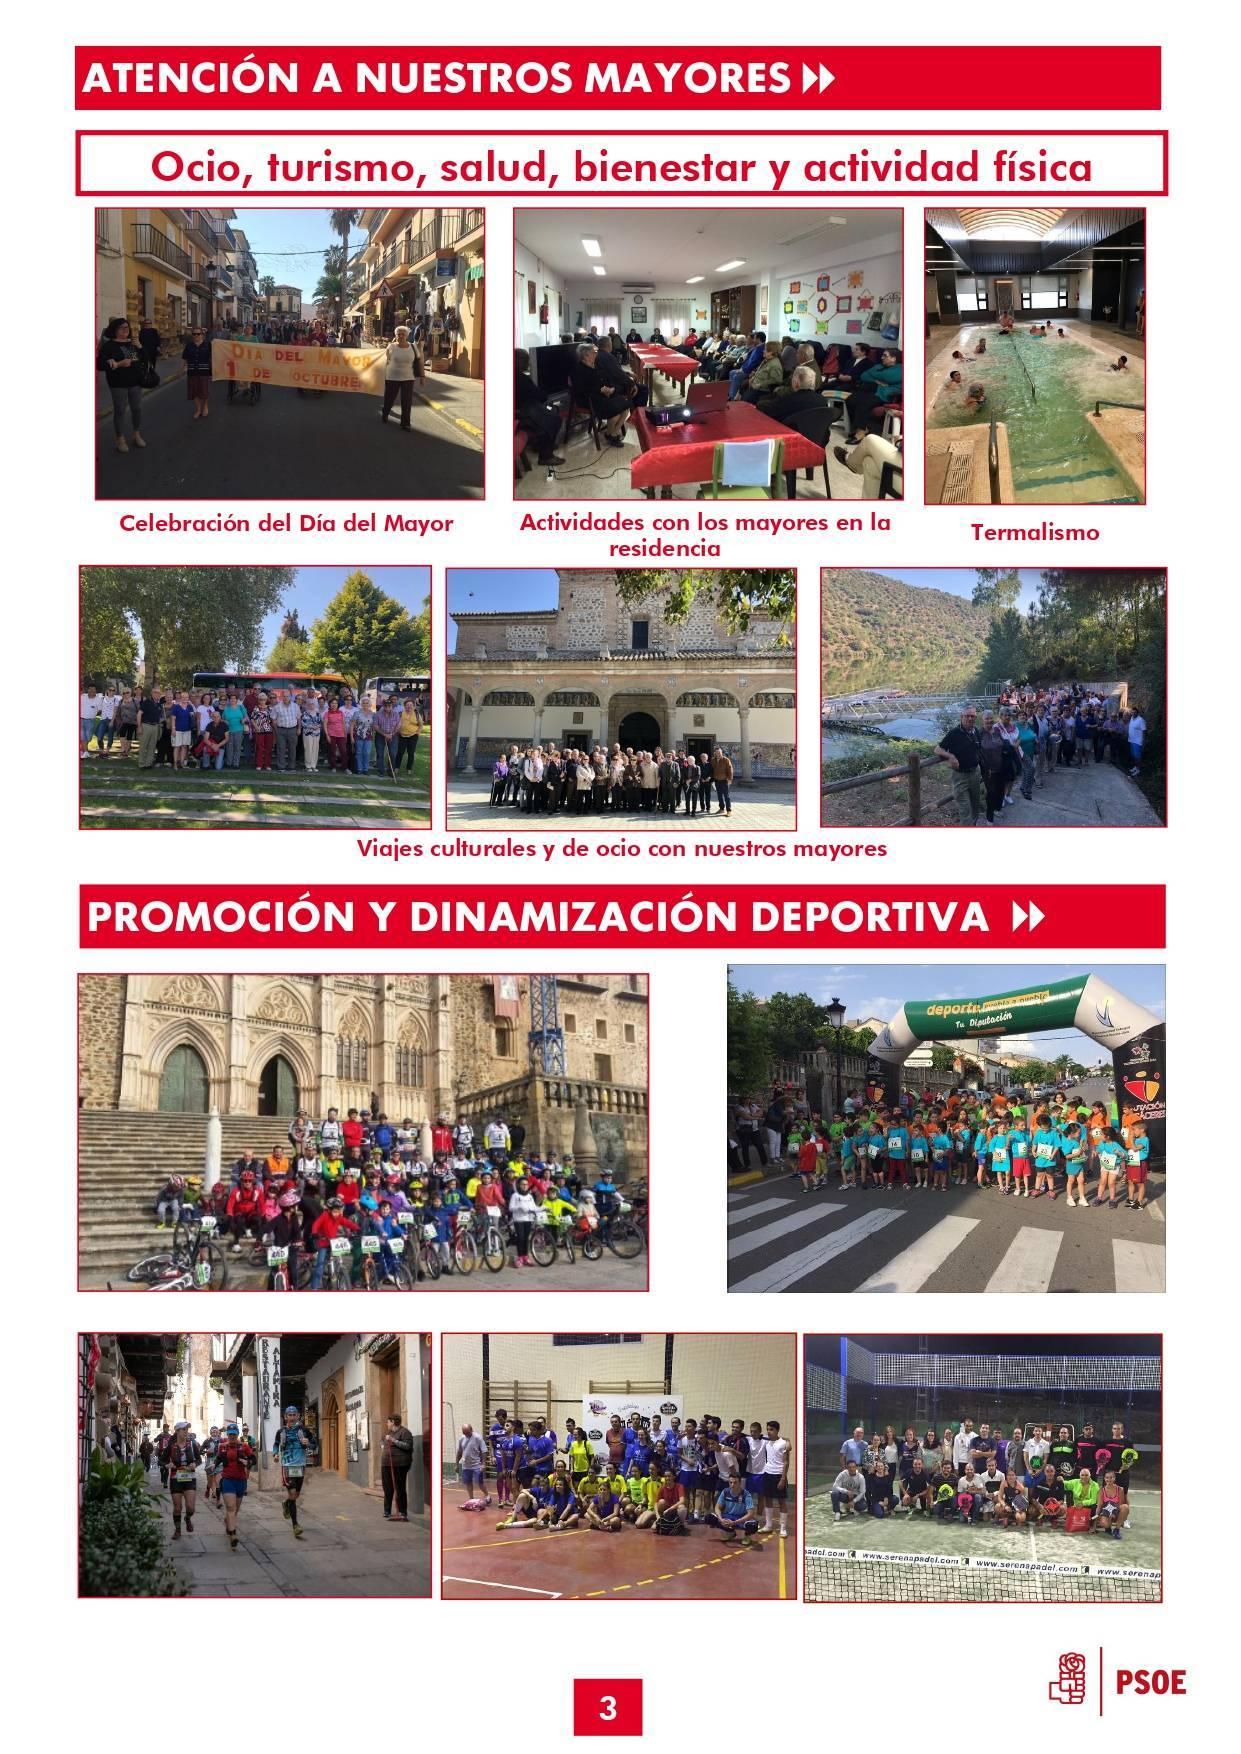 Boletín informativo de gestión municipal 2015-2019 - Guadalupe (Cáceres) 3